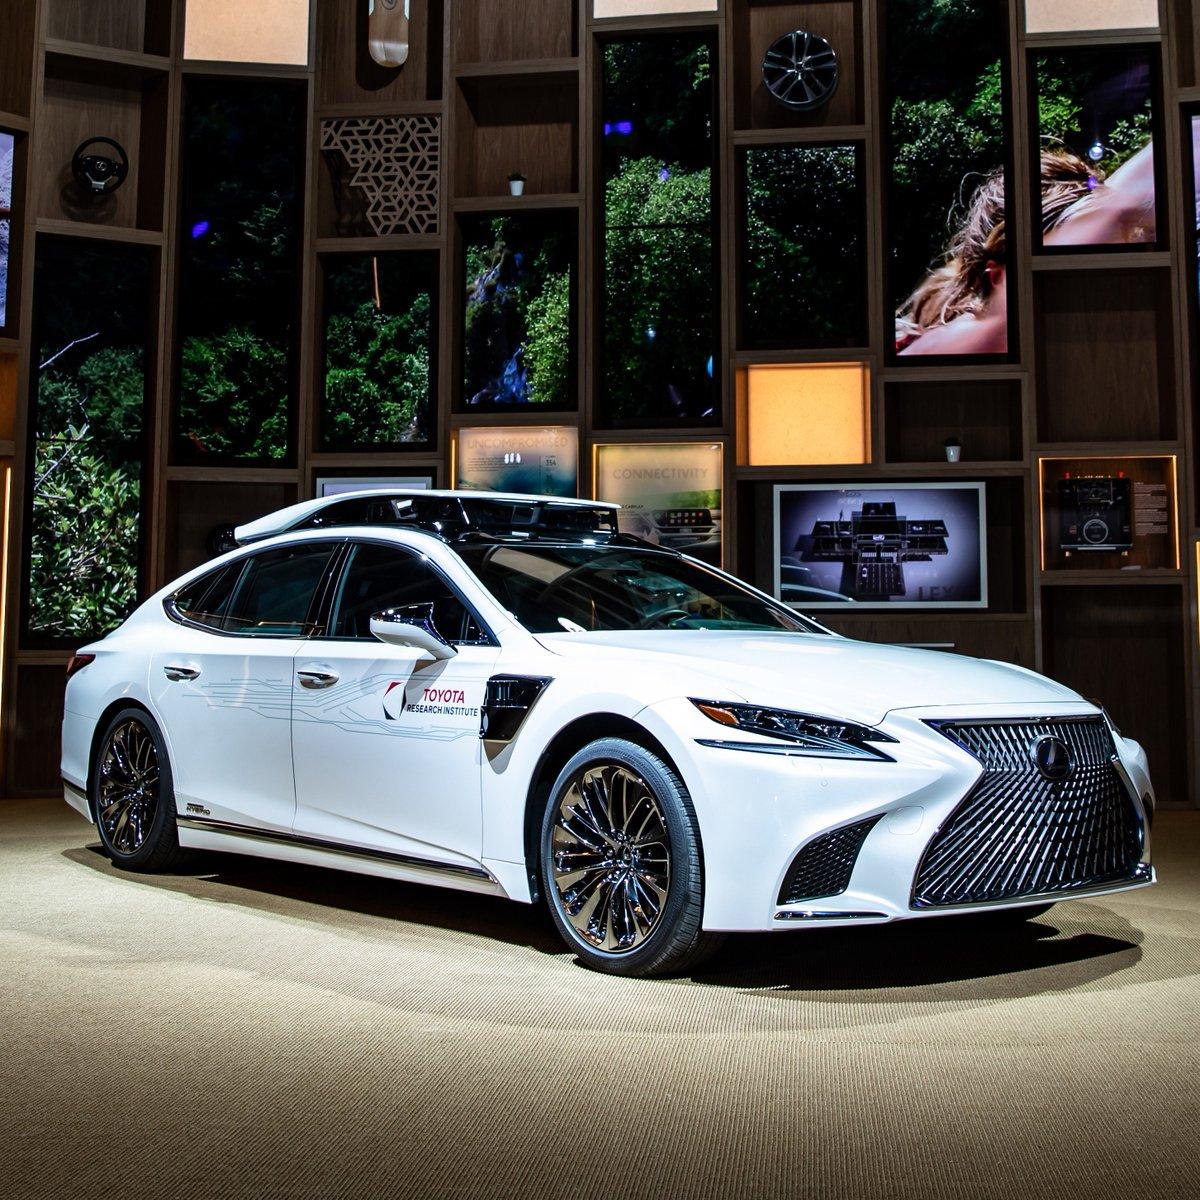 Lexus On Twitter The All Powerful Lexusls Made Autonomous Toyota